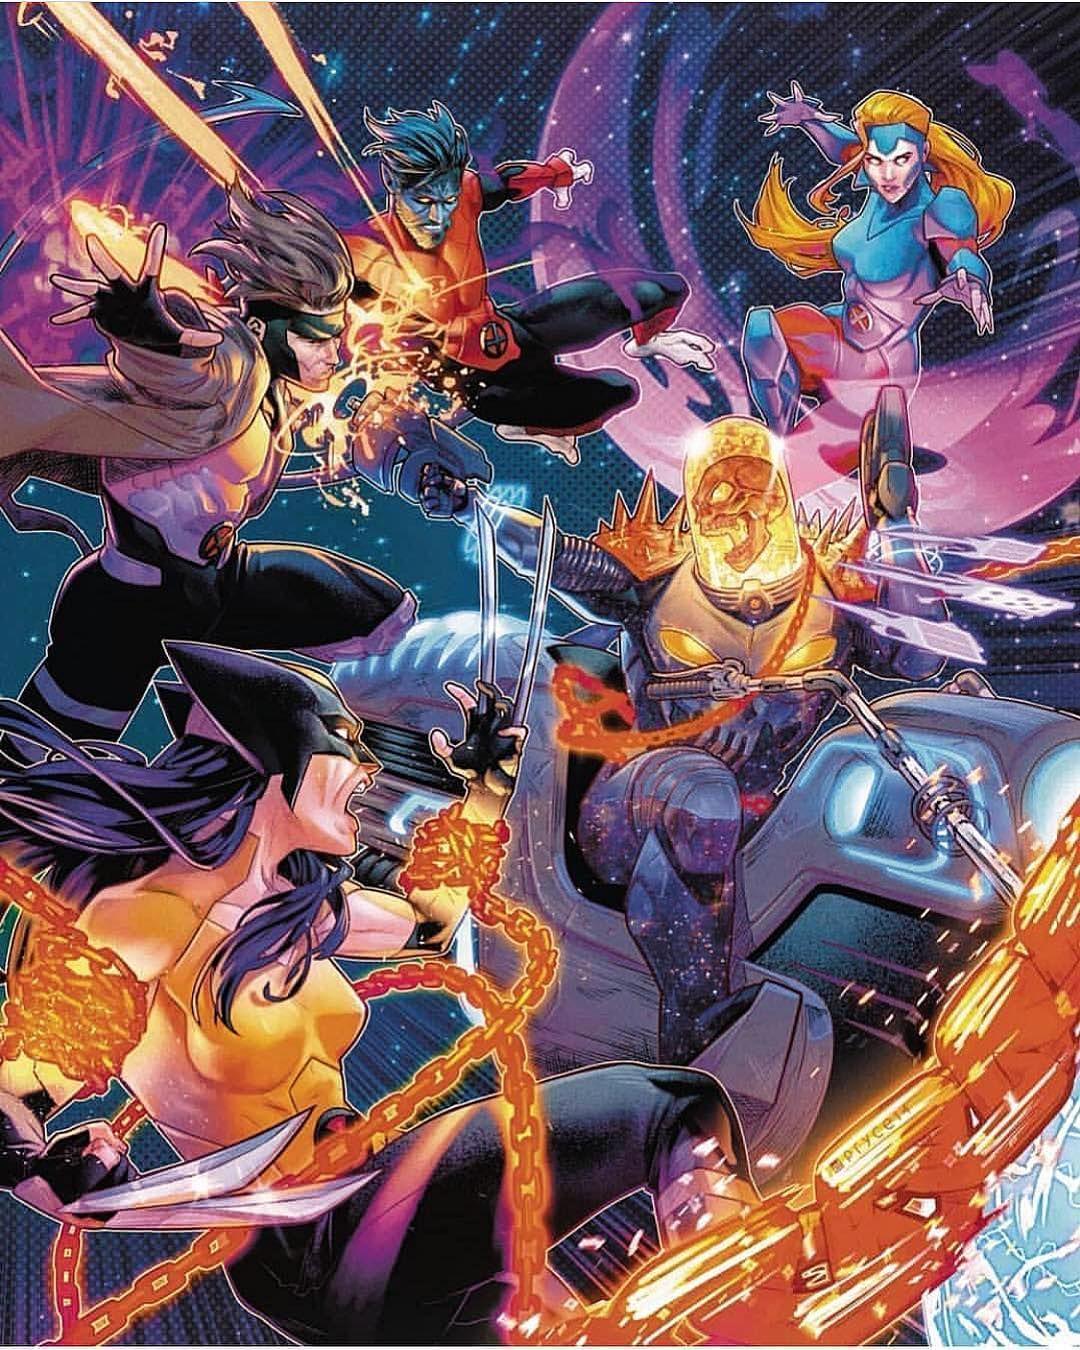 X Men Vs Cosmic Ghost Rider Pryce14 Art Marvelcomics Comics Marvel Comicbooks Avengers Avengersinfini Ghost Rider Marvel Marvel Comics Art Ghost Rider